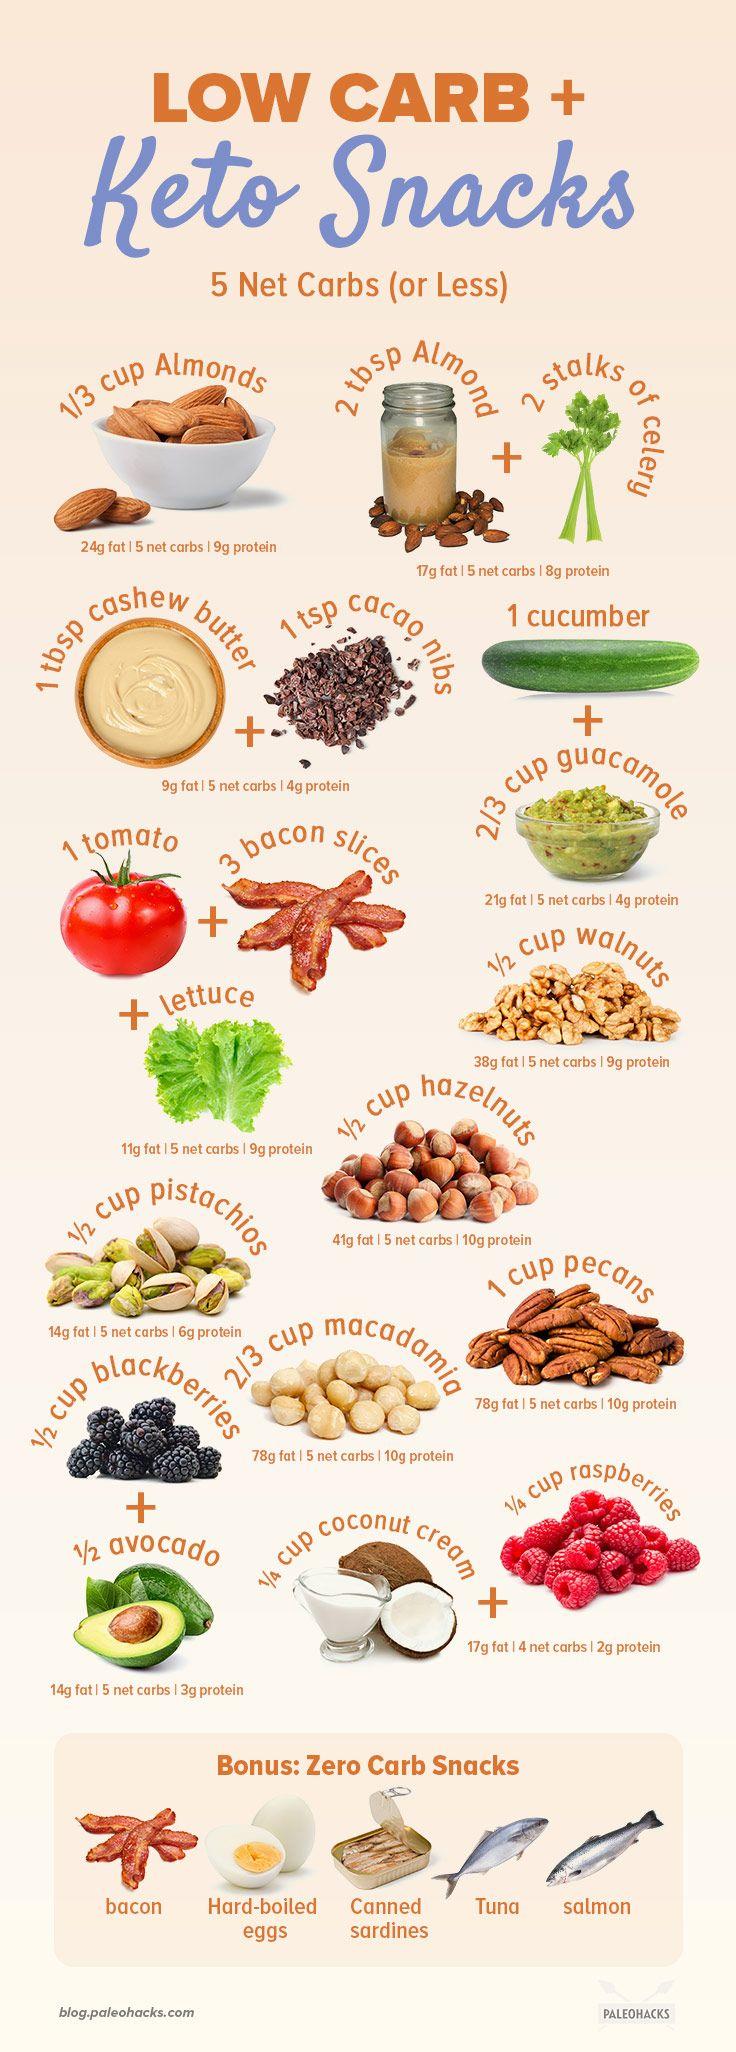 Low Carb Keto Snacks Under 5 Net Carbs 6 Zero Carb Foods Zero Carb Foods Keto Diet Recipes Keto Meal Plan